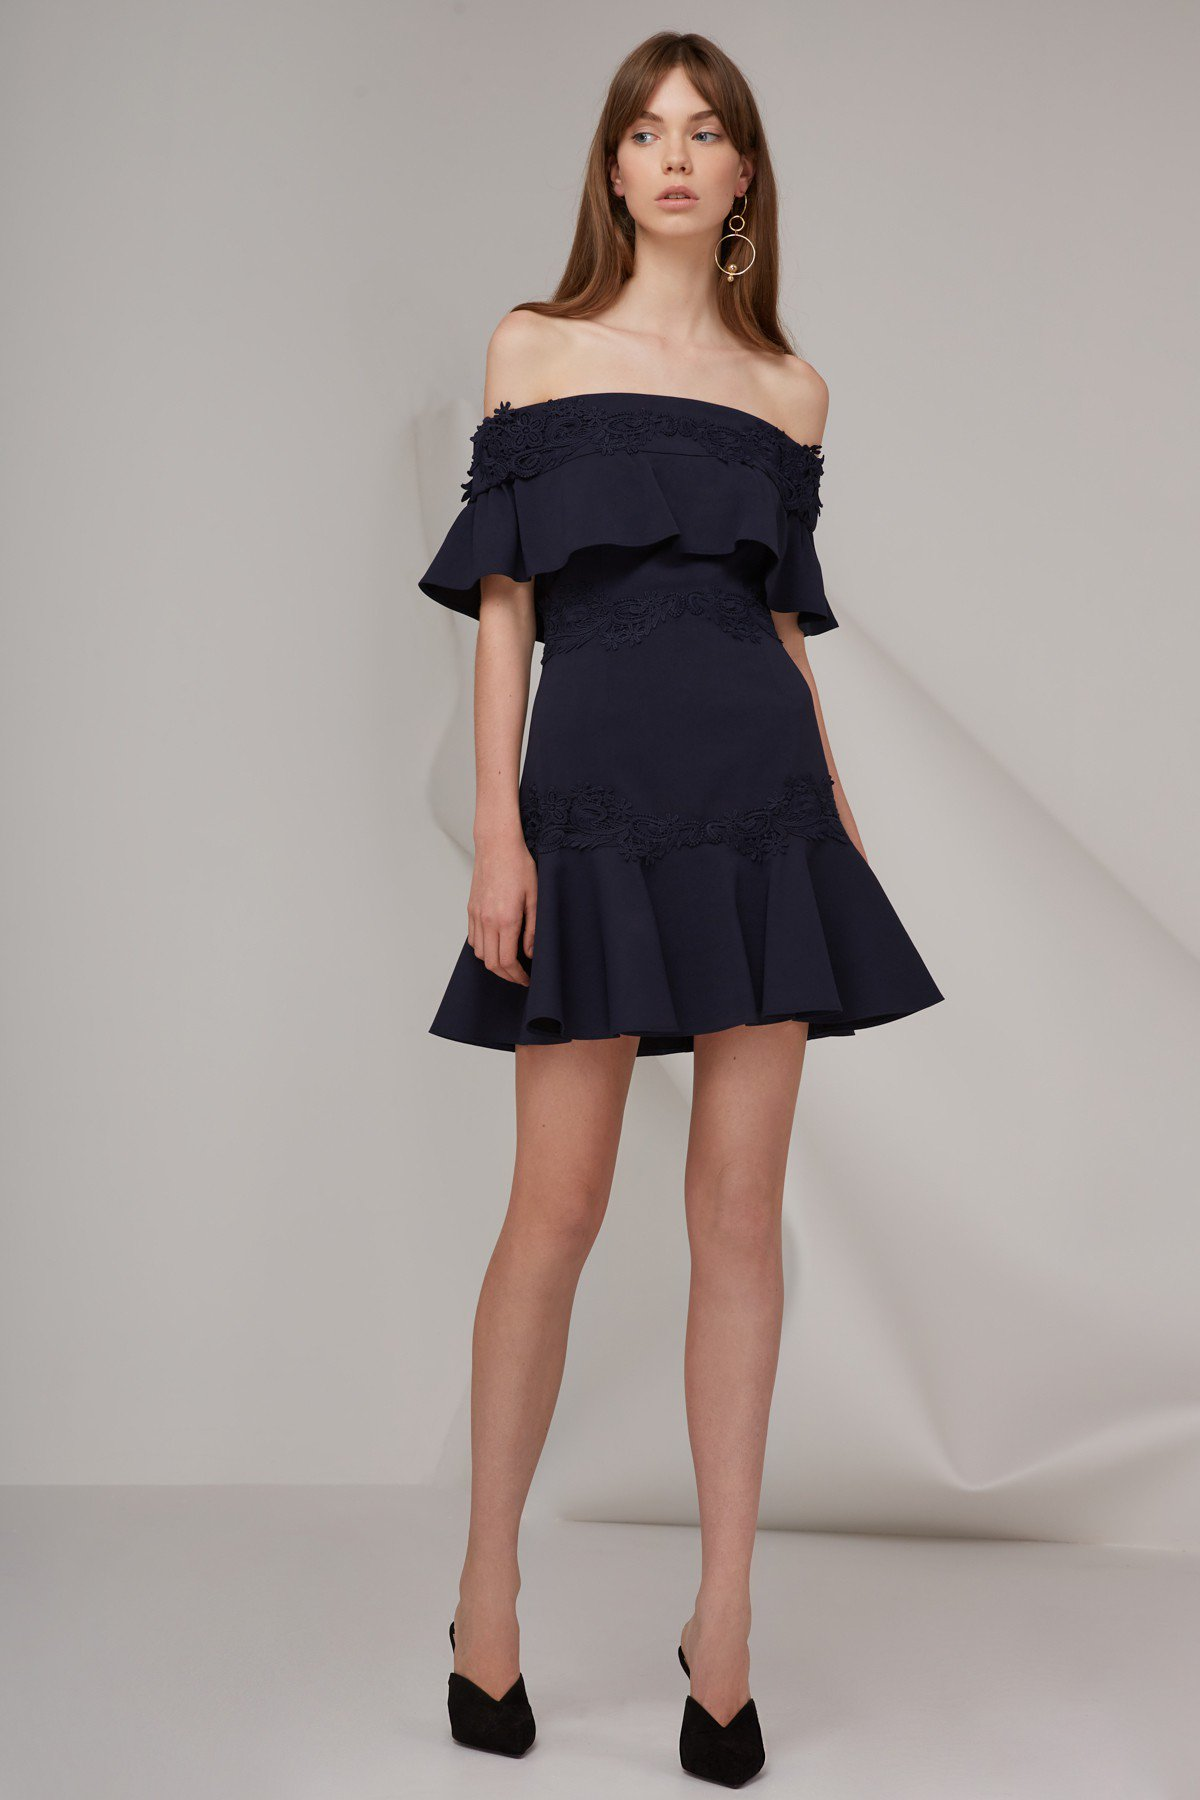 Shop Sweet Dreams Mini Dress.